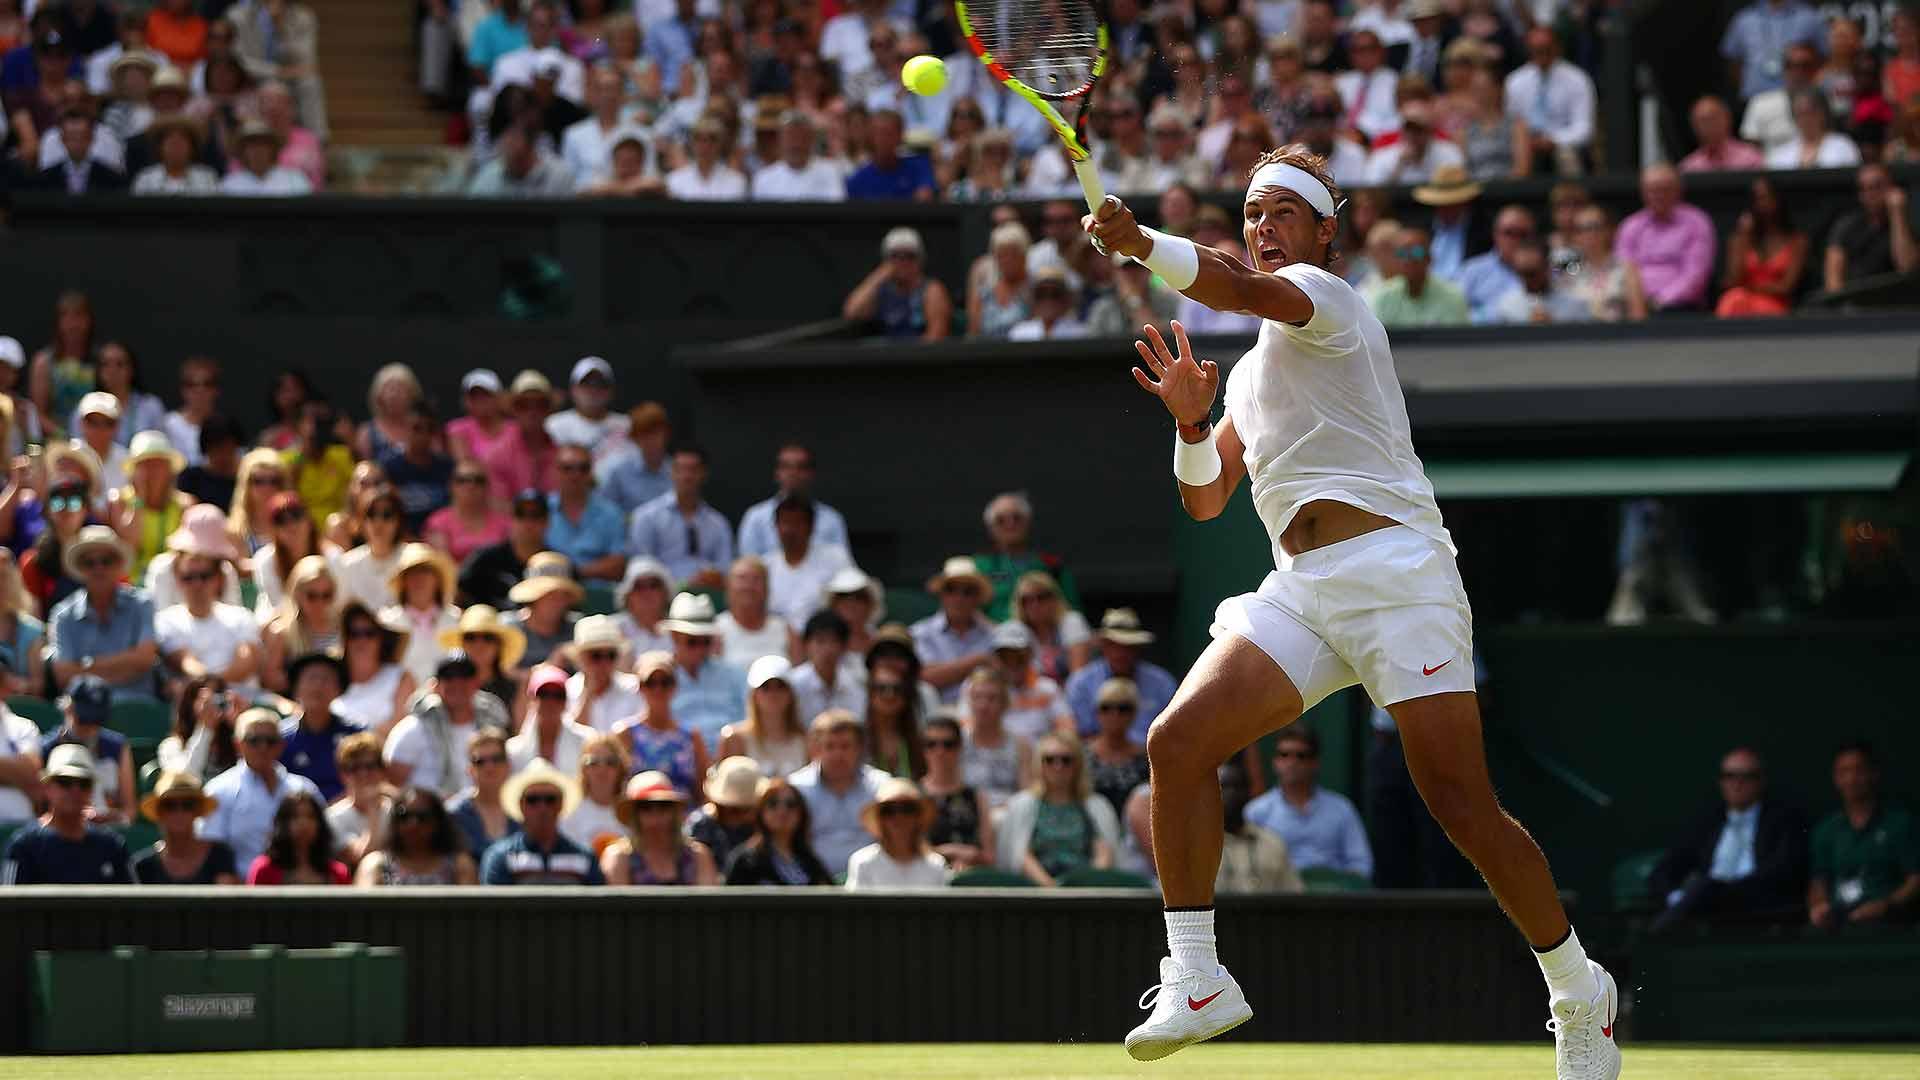 Rafa's Rout  2️⃣-time �� breezes past Sela 6-3, 6-3, 6-2 and improves to 44-10 at #Wimbledon. ���� ����  #ATP https://t.co/B0eUi7WqDx